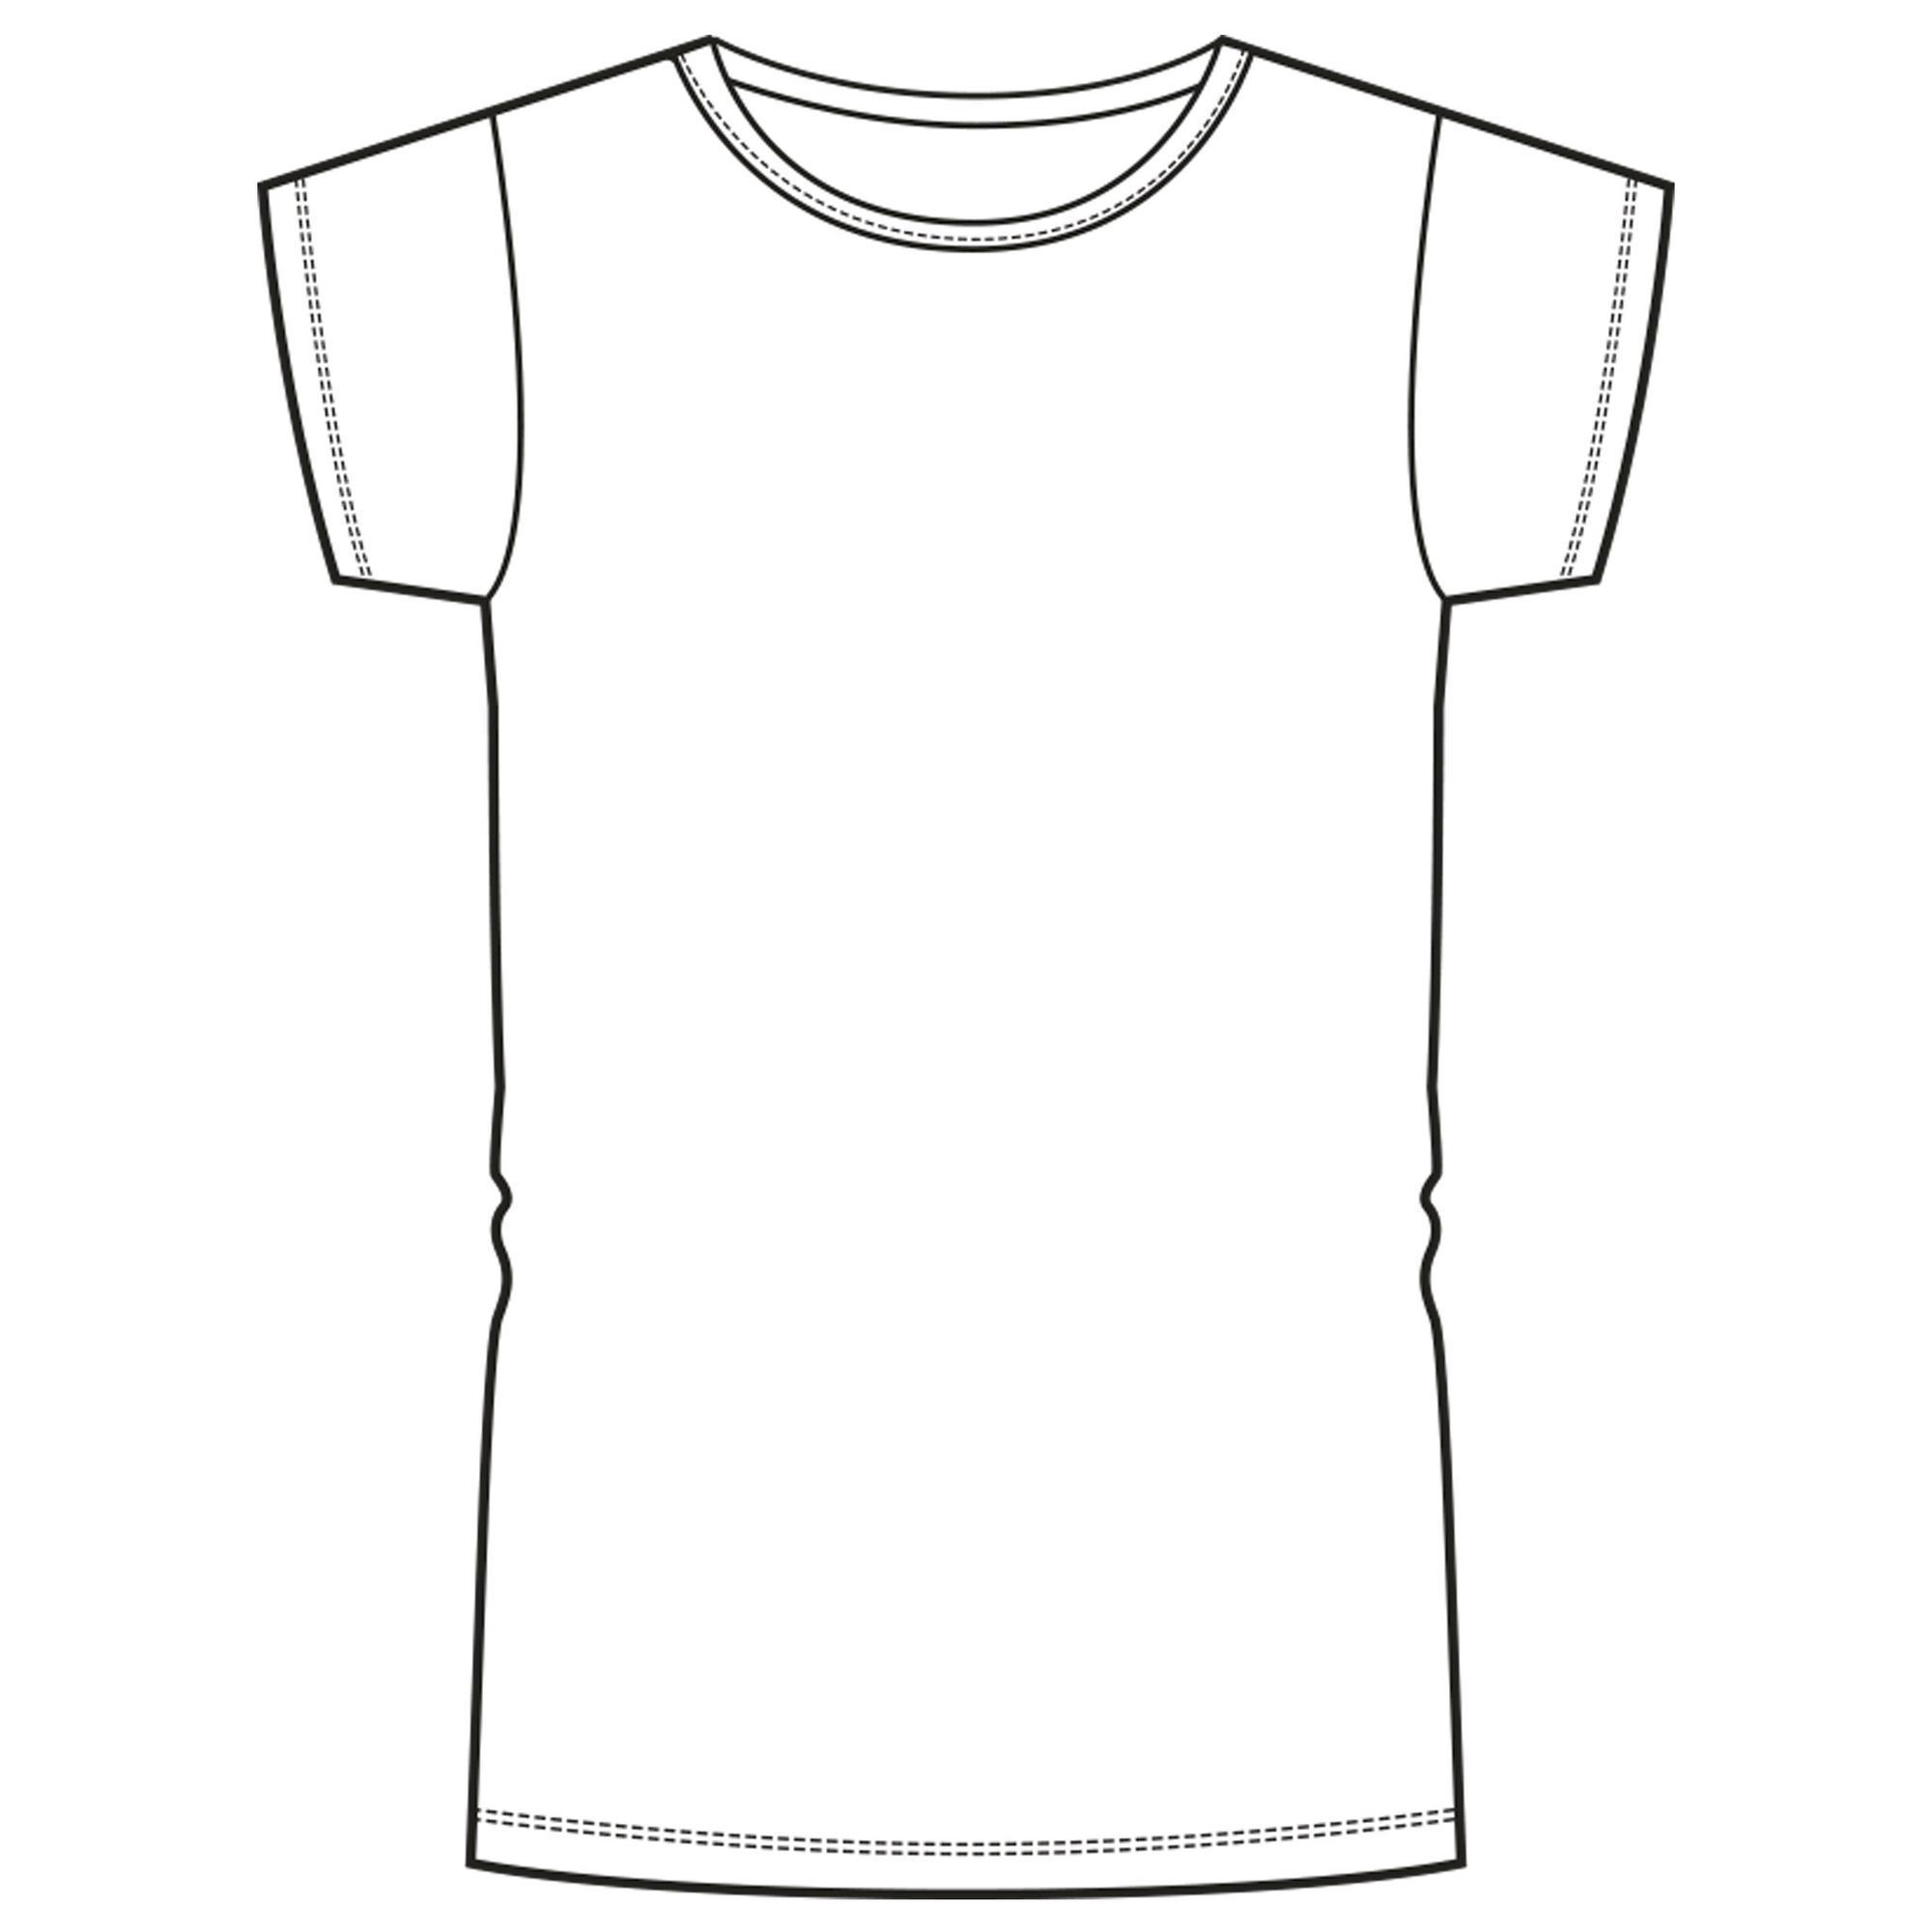 47598c85db977 decathlon tee shirt blanc enfant T-Shirt manches courtes 100 fille GYM ...